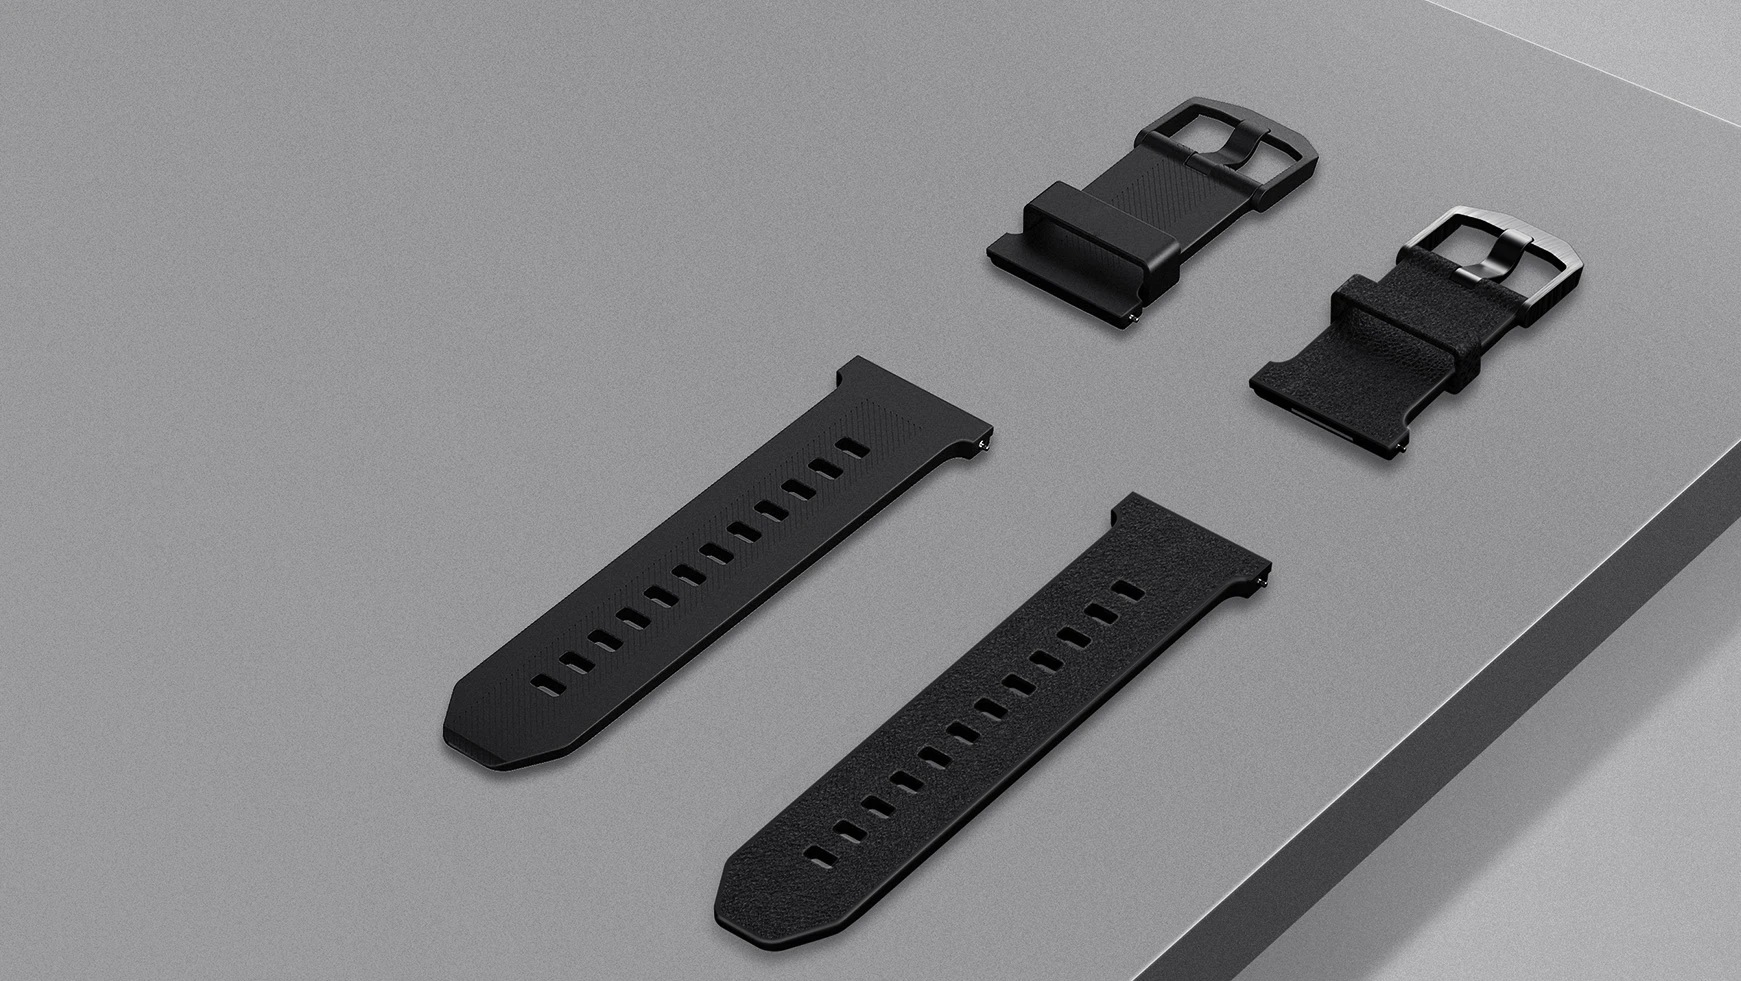 Nubia Watch straps